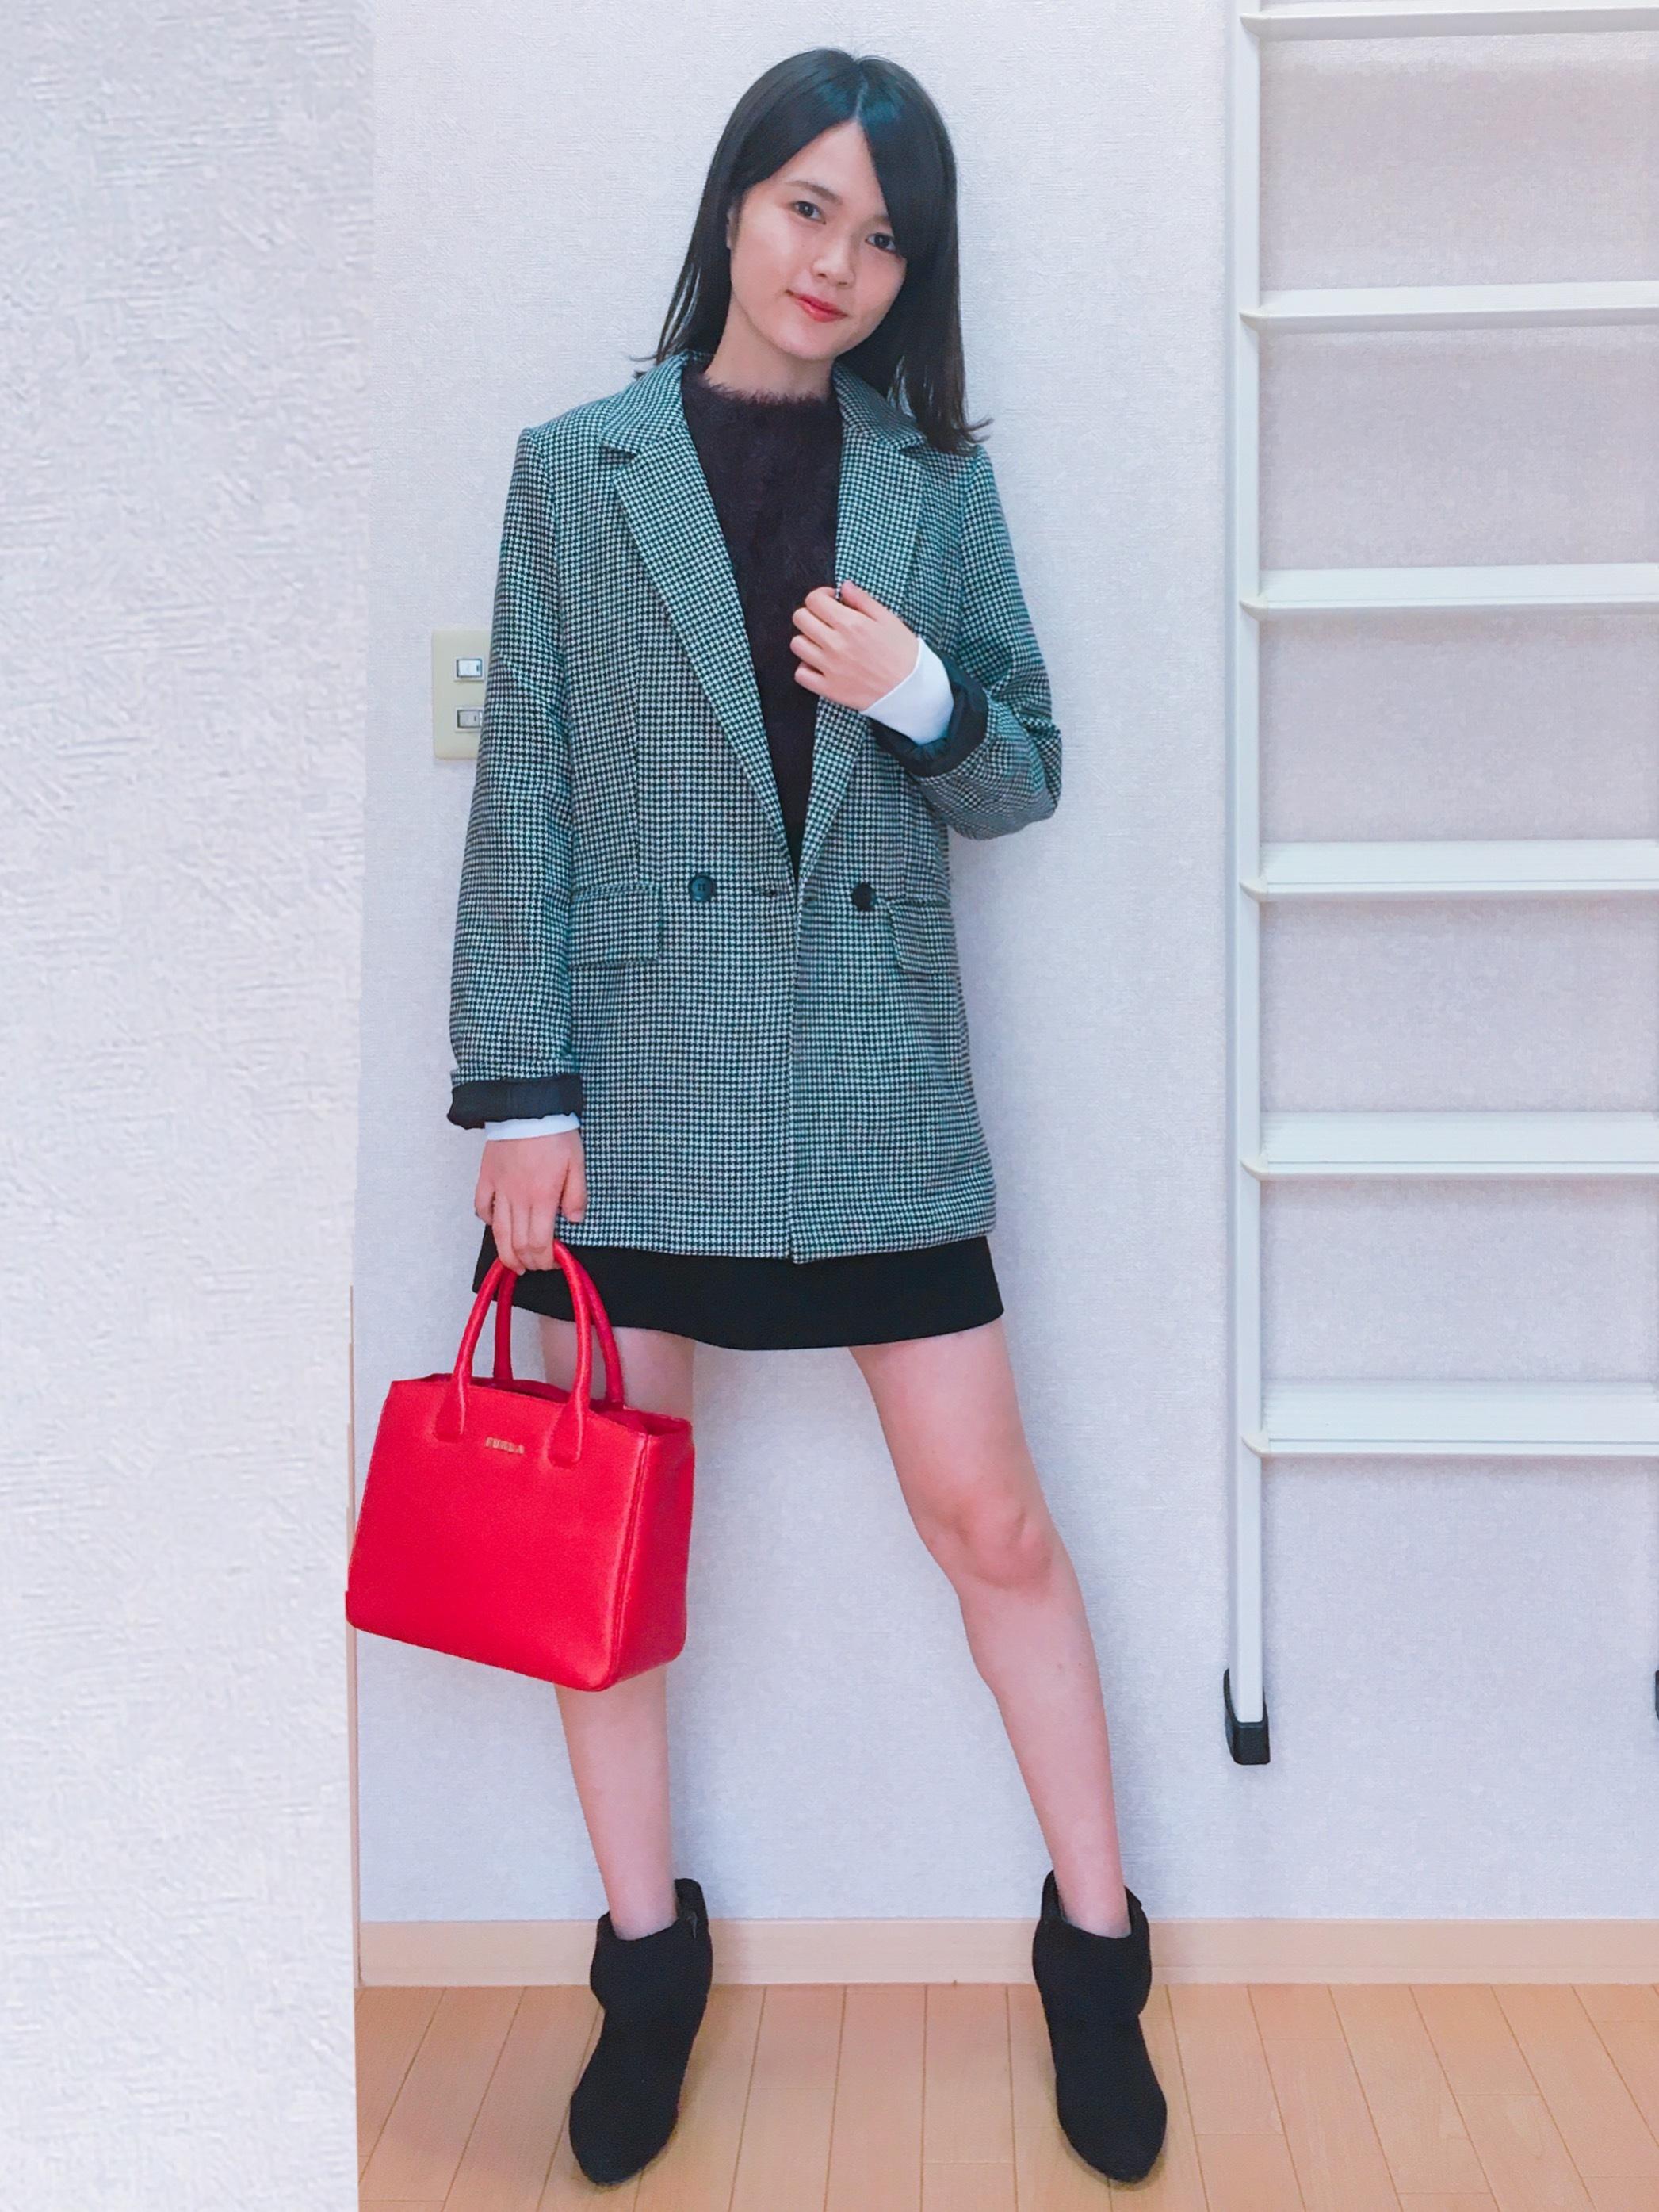 ^o^第36回【服はほぼプチプラ】ジャケットを使ったコーデ3選〜!_1_3